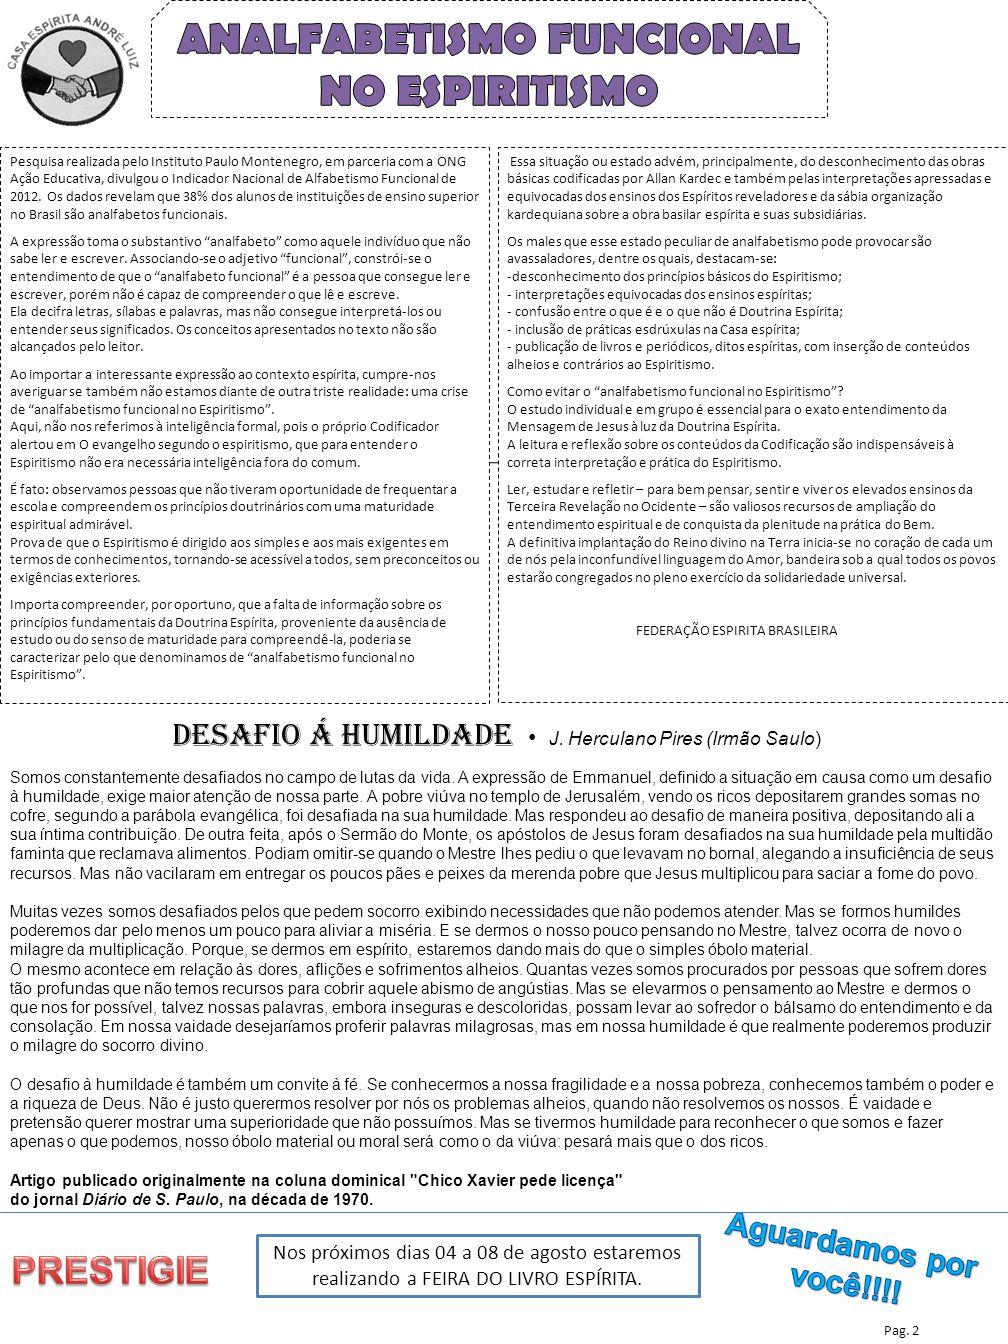 ANALFABETISMO FUNCIONAL NO ESPIRITISMO